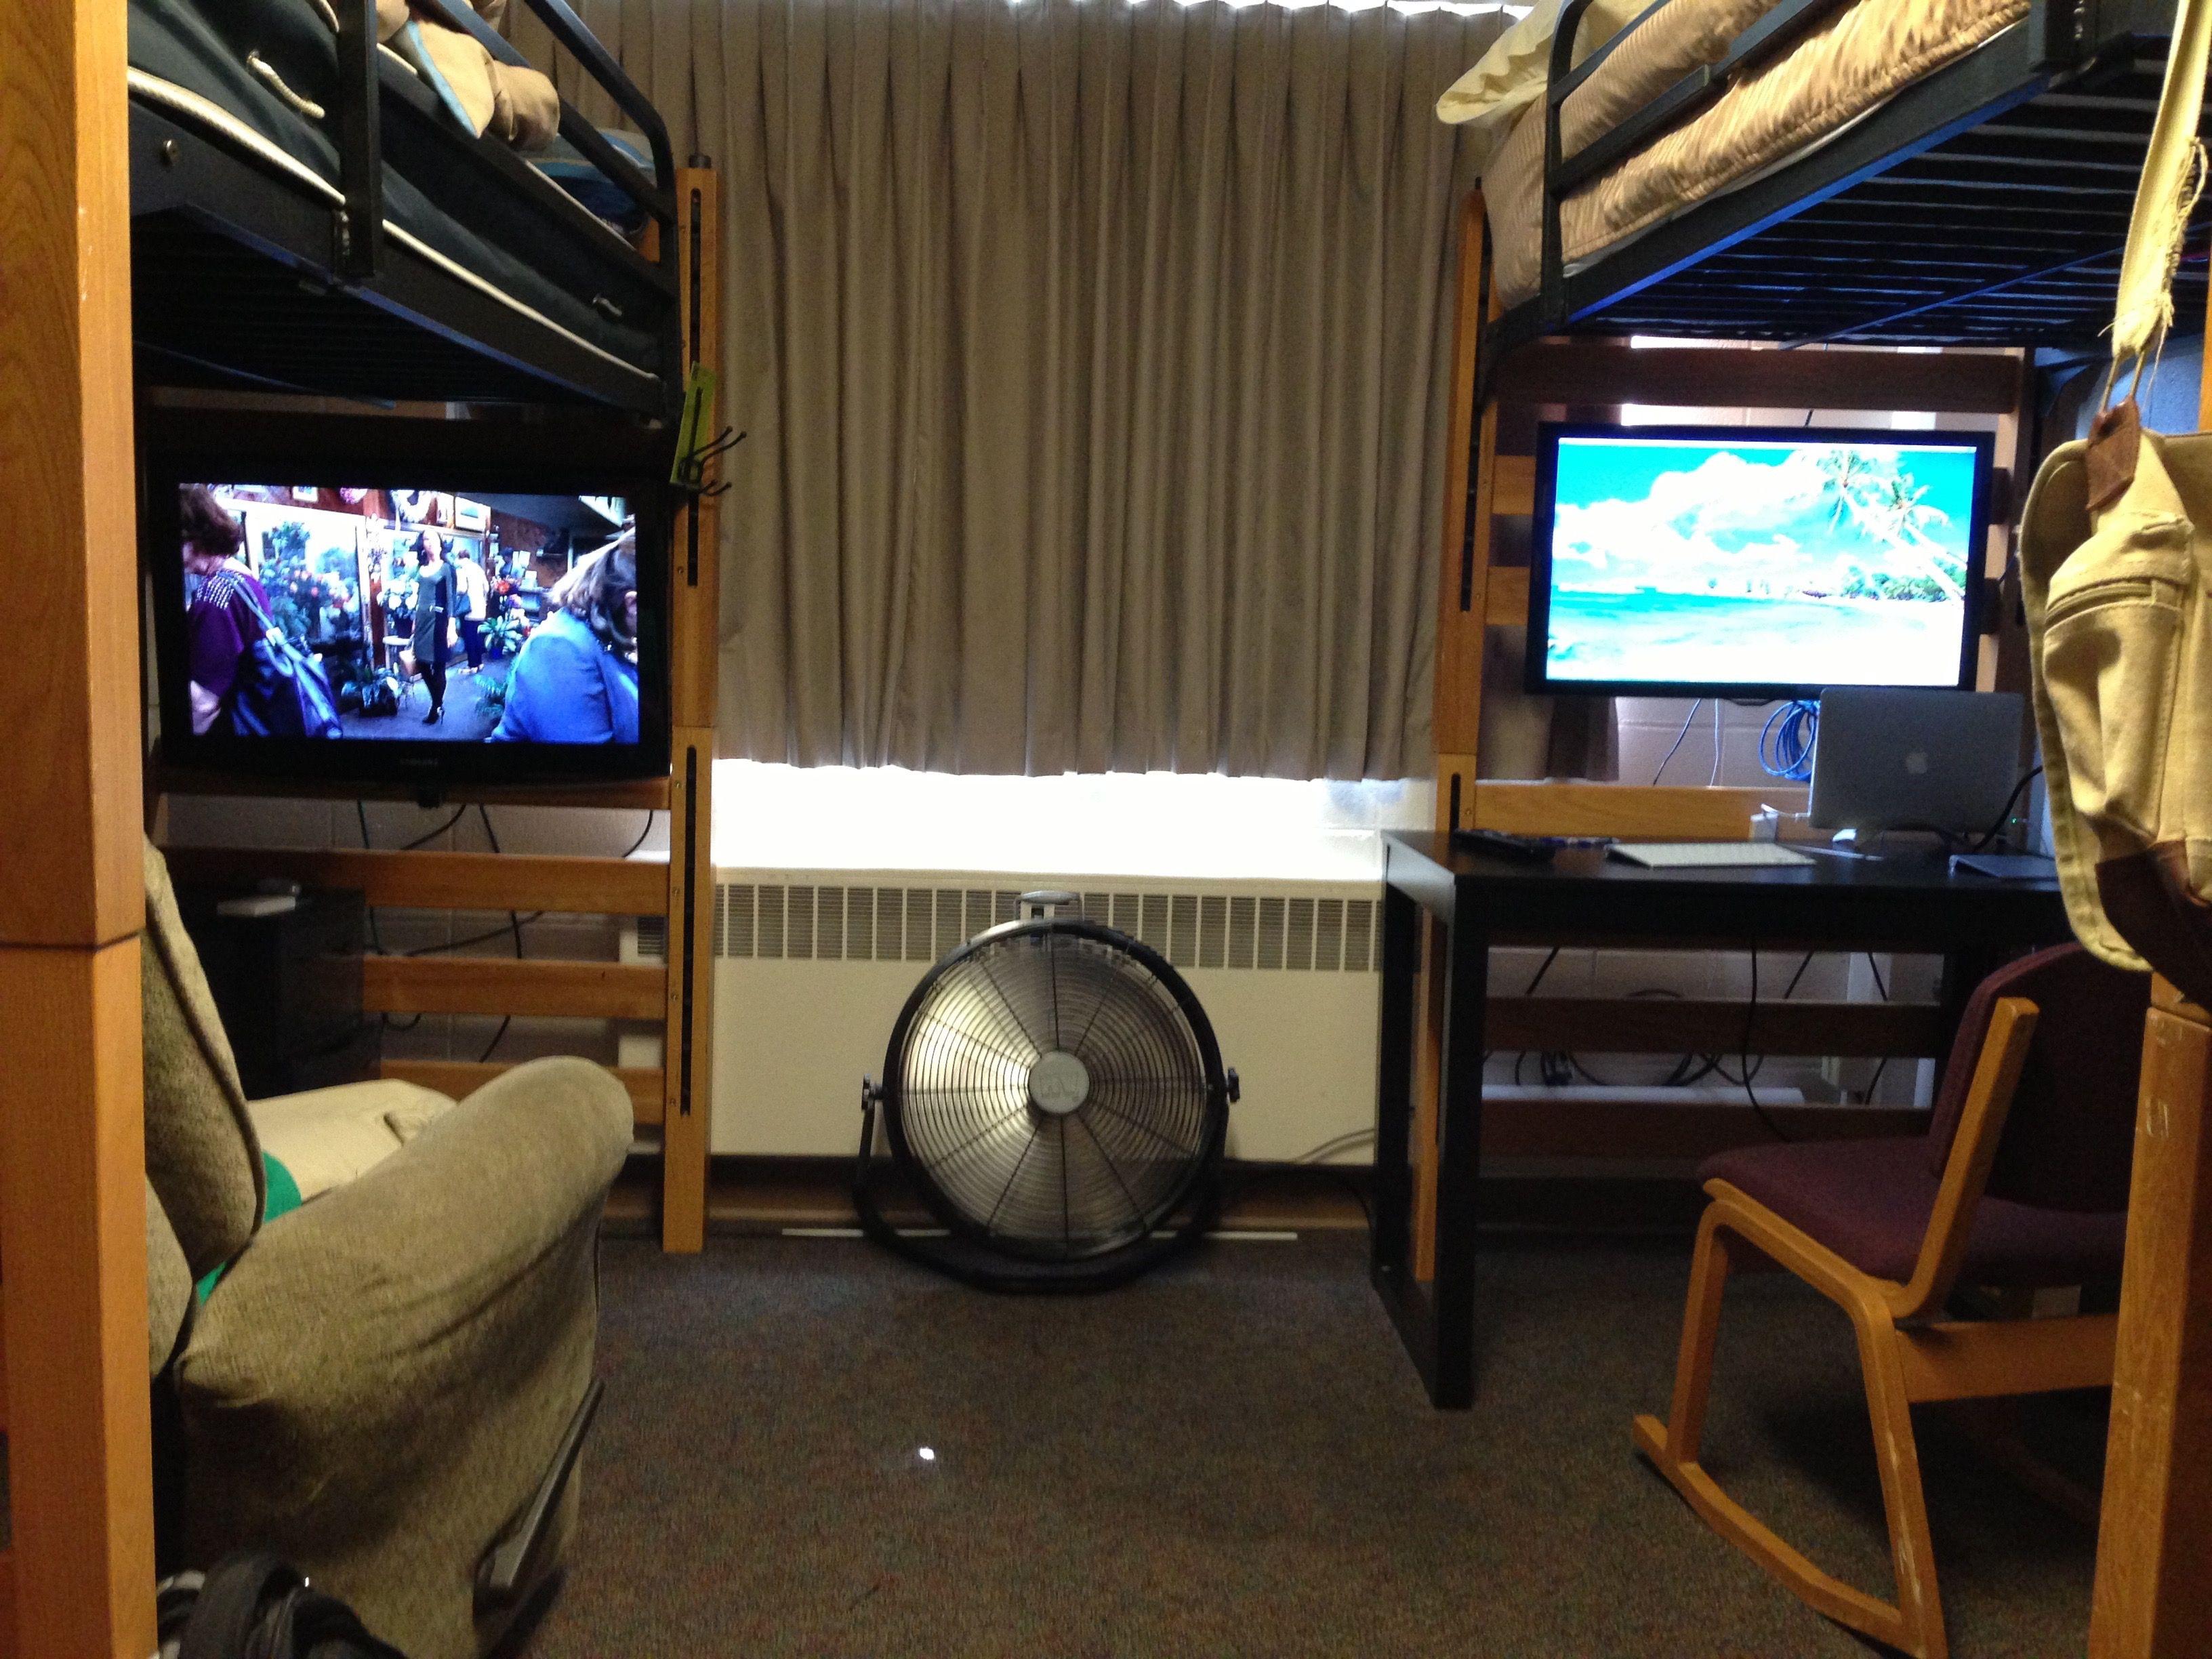 Pin By Huk Tv Mounts On Huk Tv Mounts Guy Dorm Rooms Lofted Dorm Beds Dorm Living